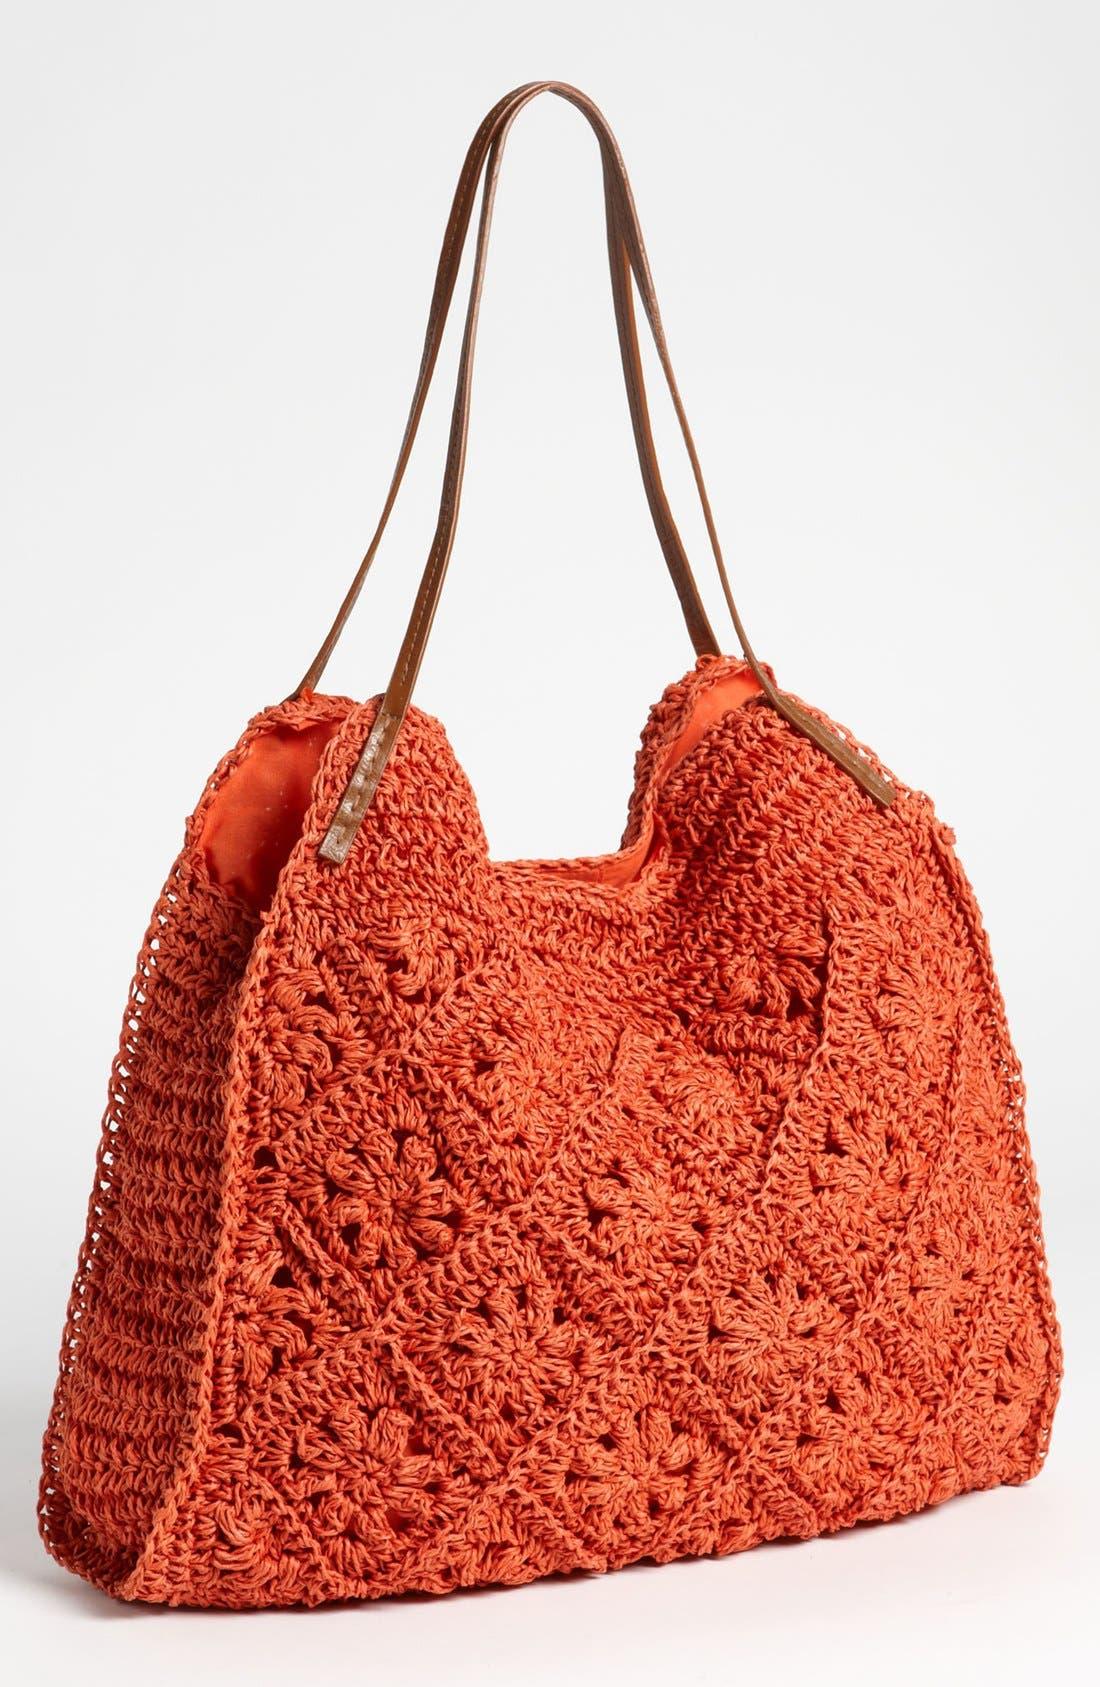 Main Image - Straw Studios Crochet Tote